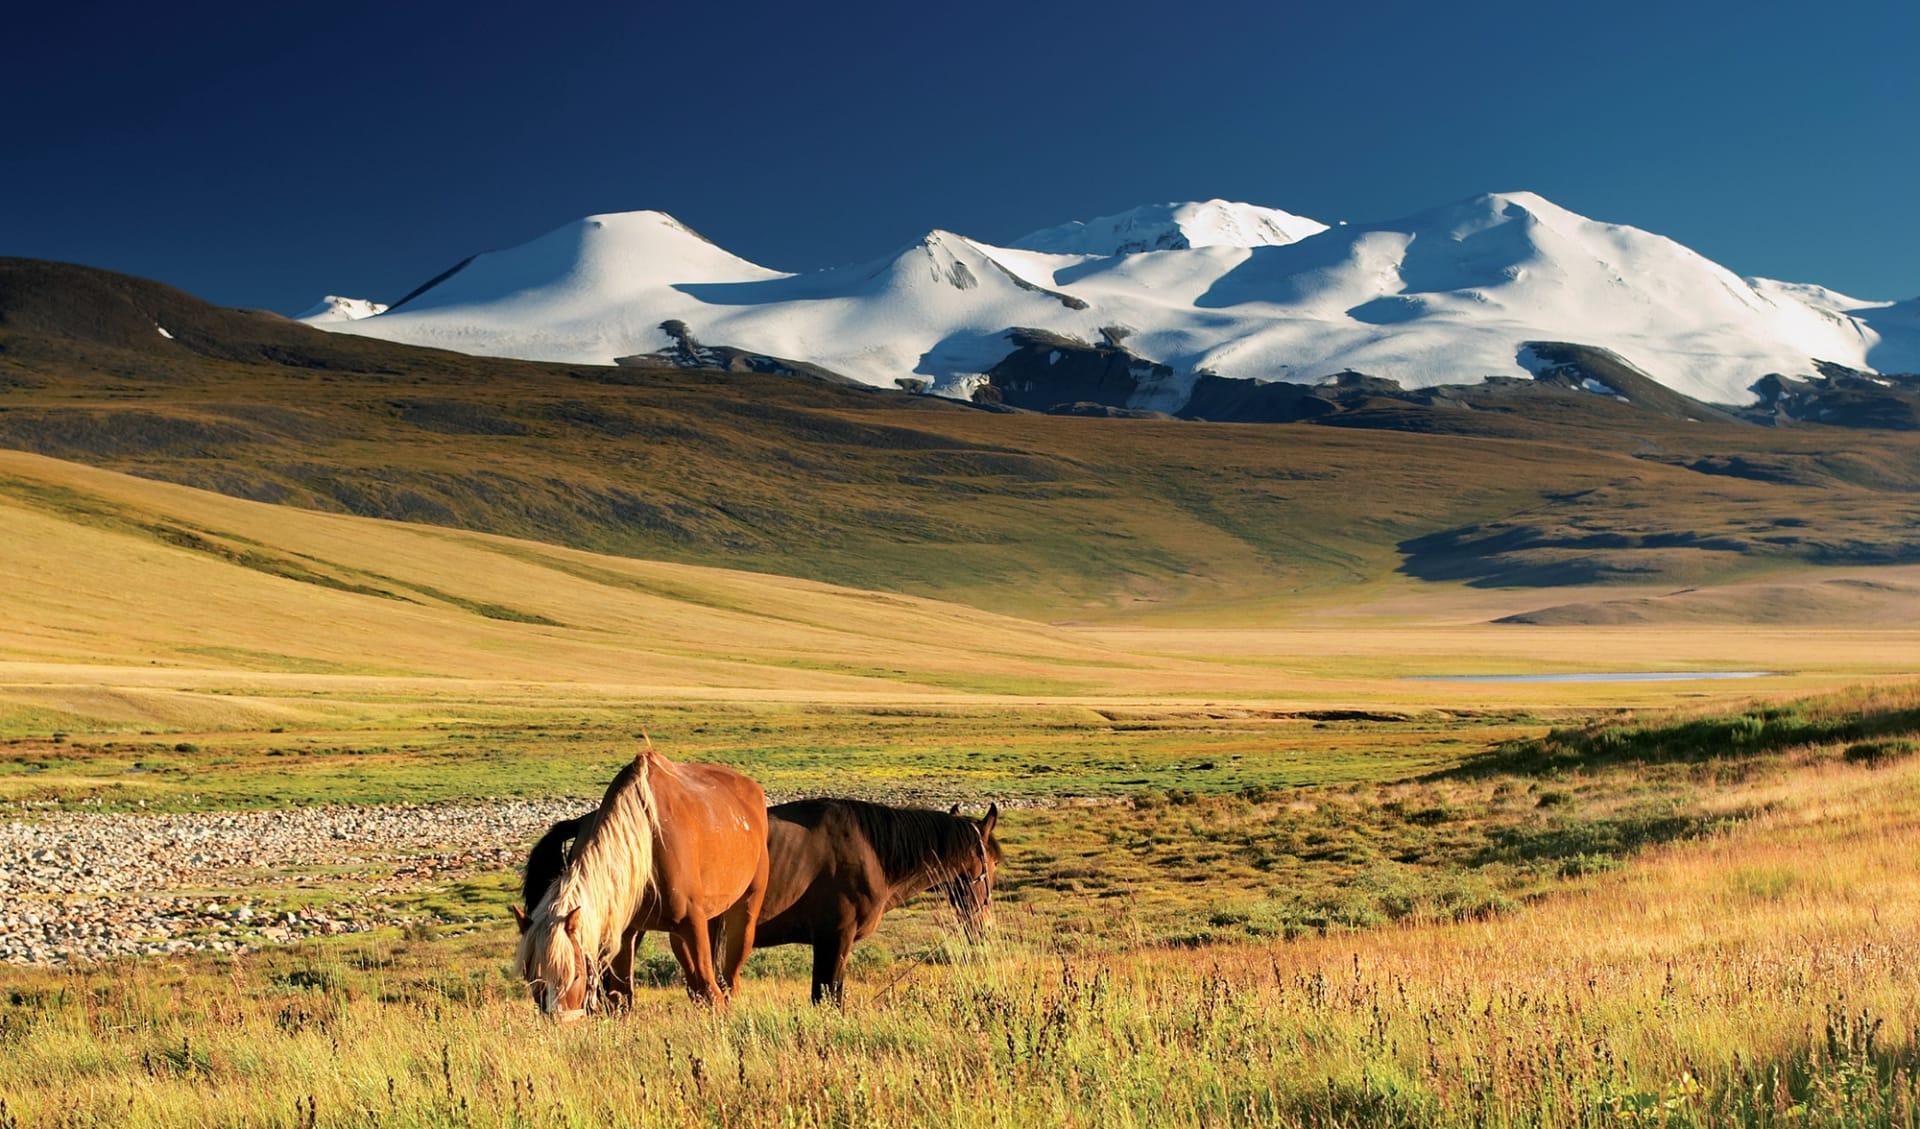 Hauptstadt des Dschingis Khan ab Ulaanbaatar: Mongolei_Wildpferde_